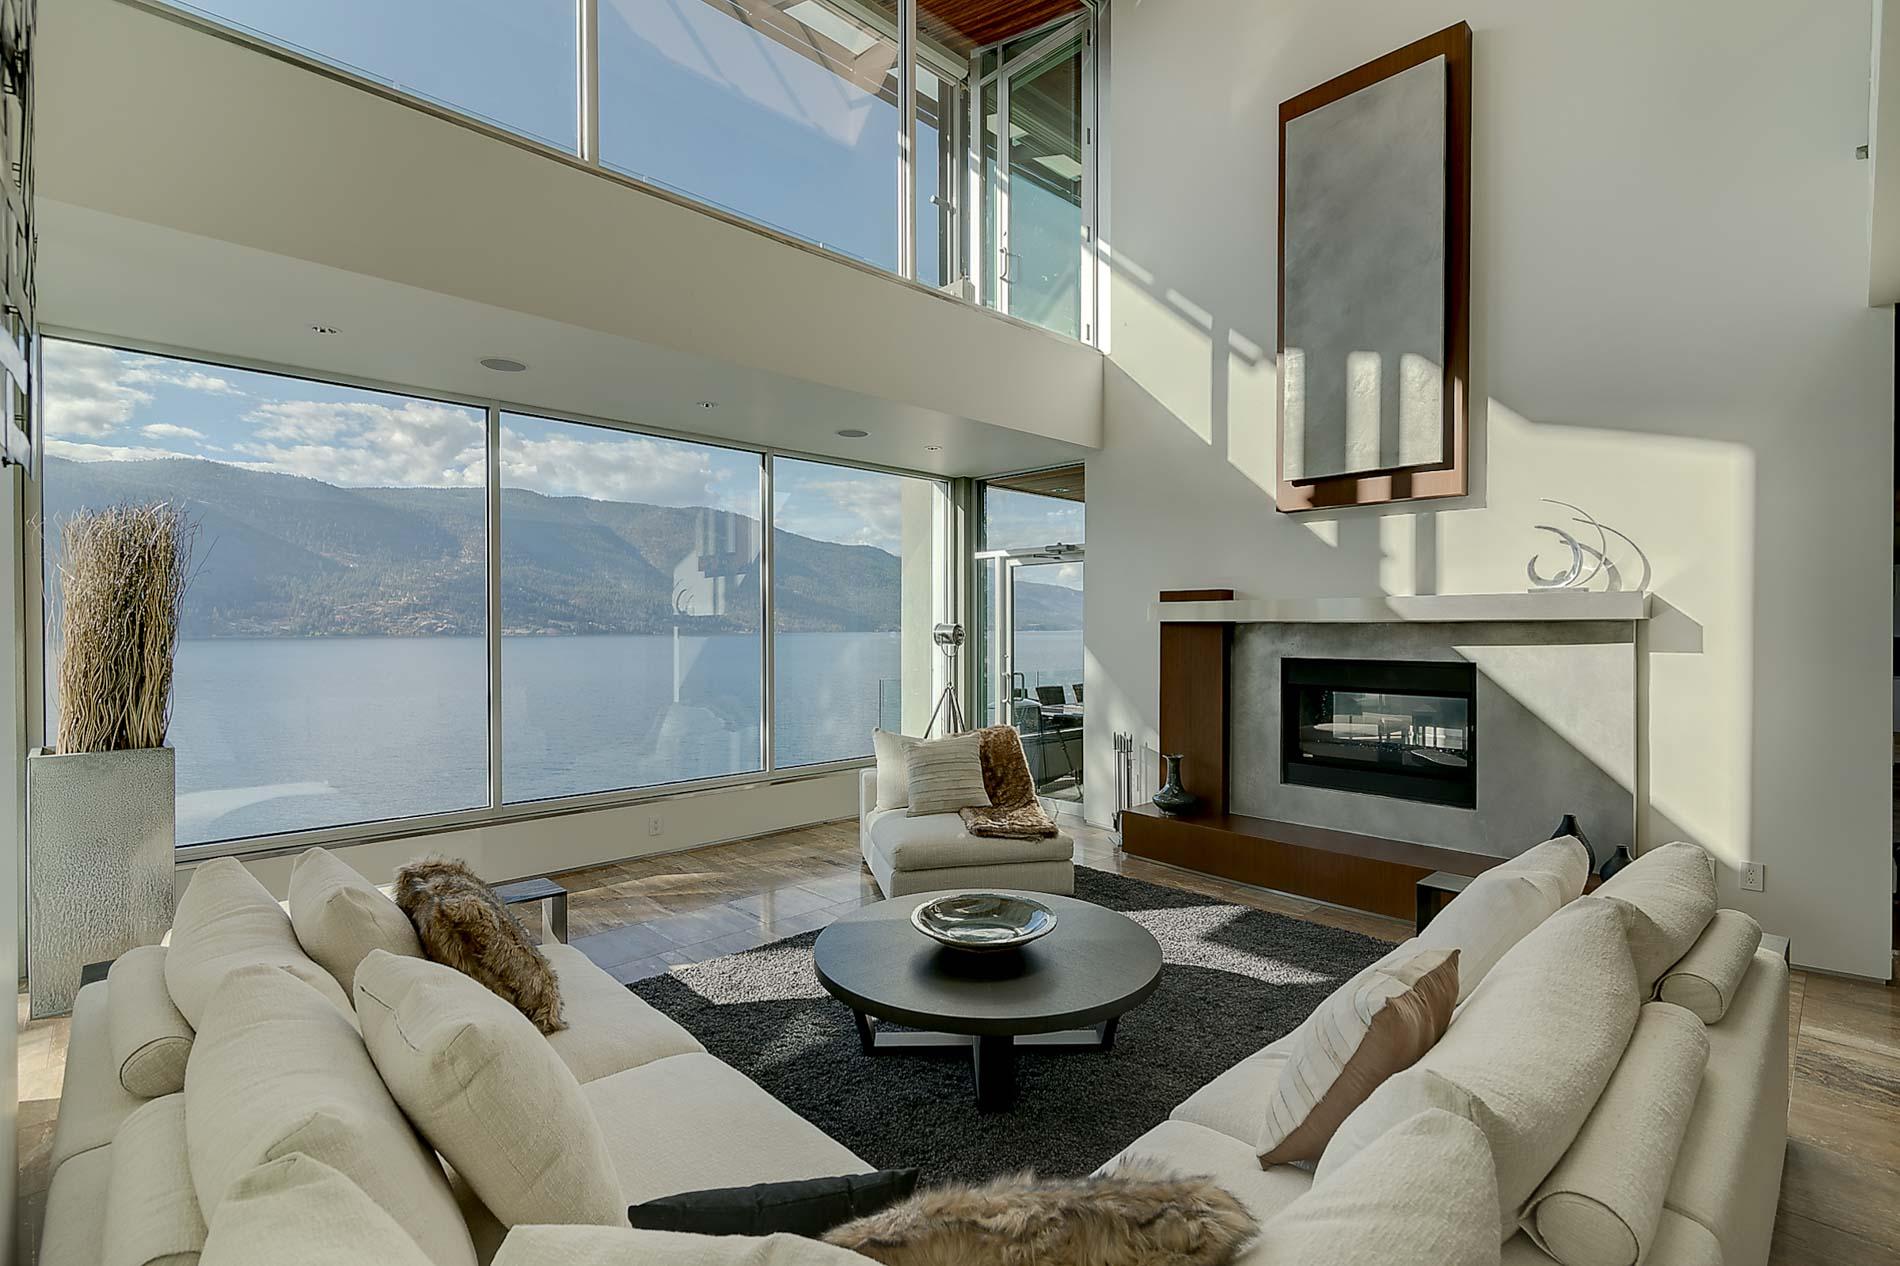 2600 Dubbin Kelowna House Of Concrete And Glass